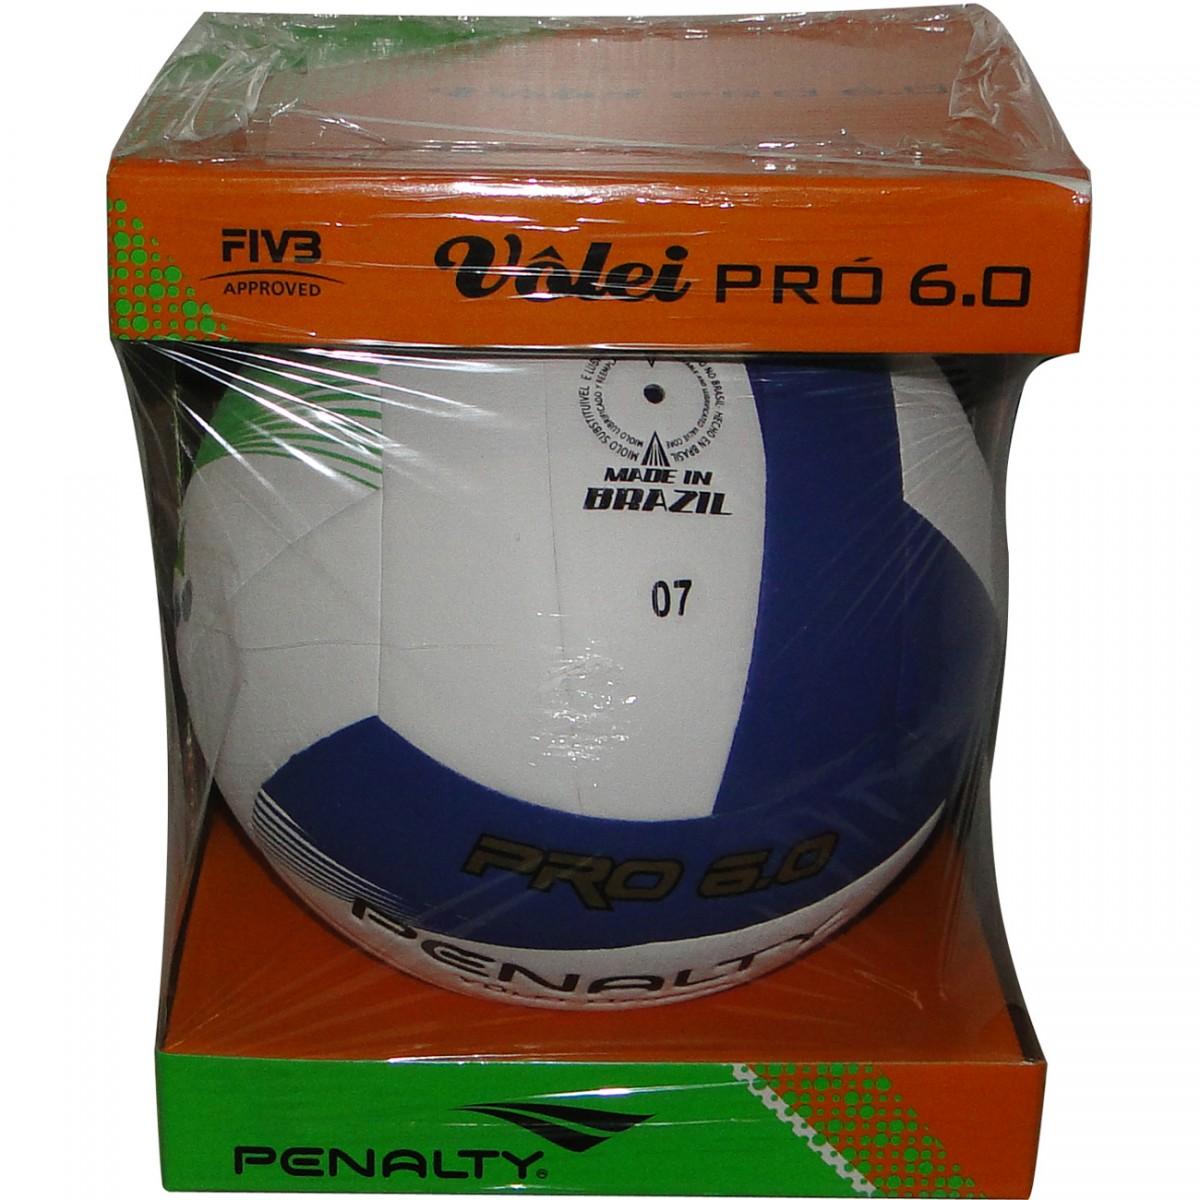 Bola Penalty Volei 6.0 Pro 3622 - BRANCO AZUL VERDE - Chuteira Nike ... 3bb7a8b233ce8